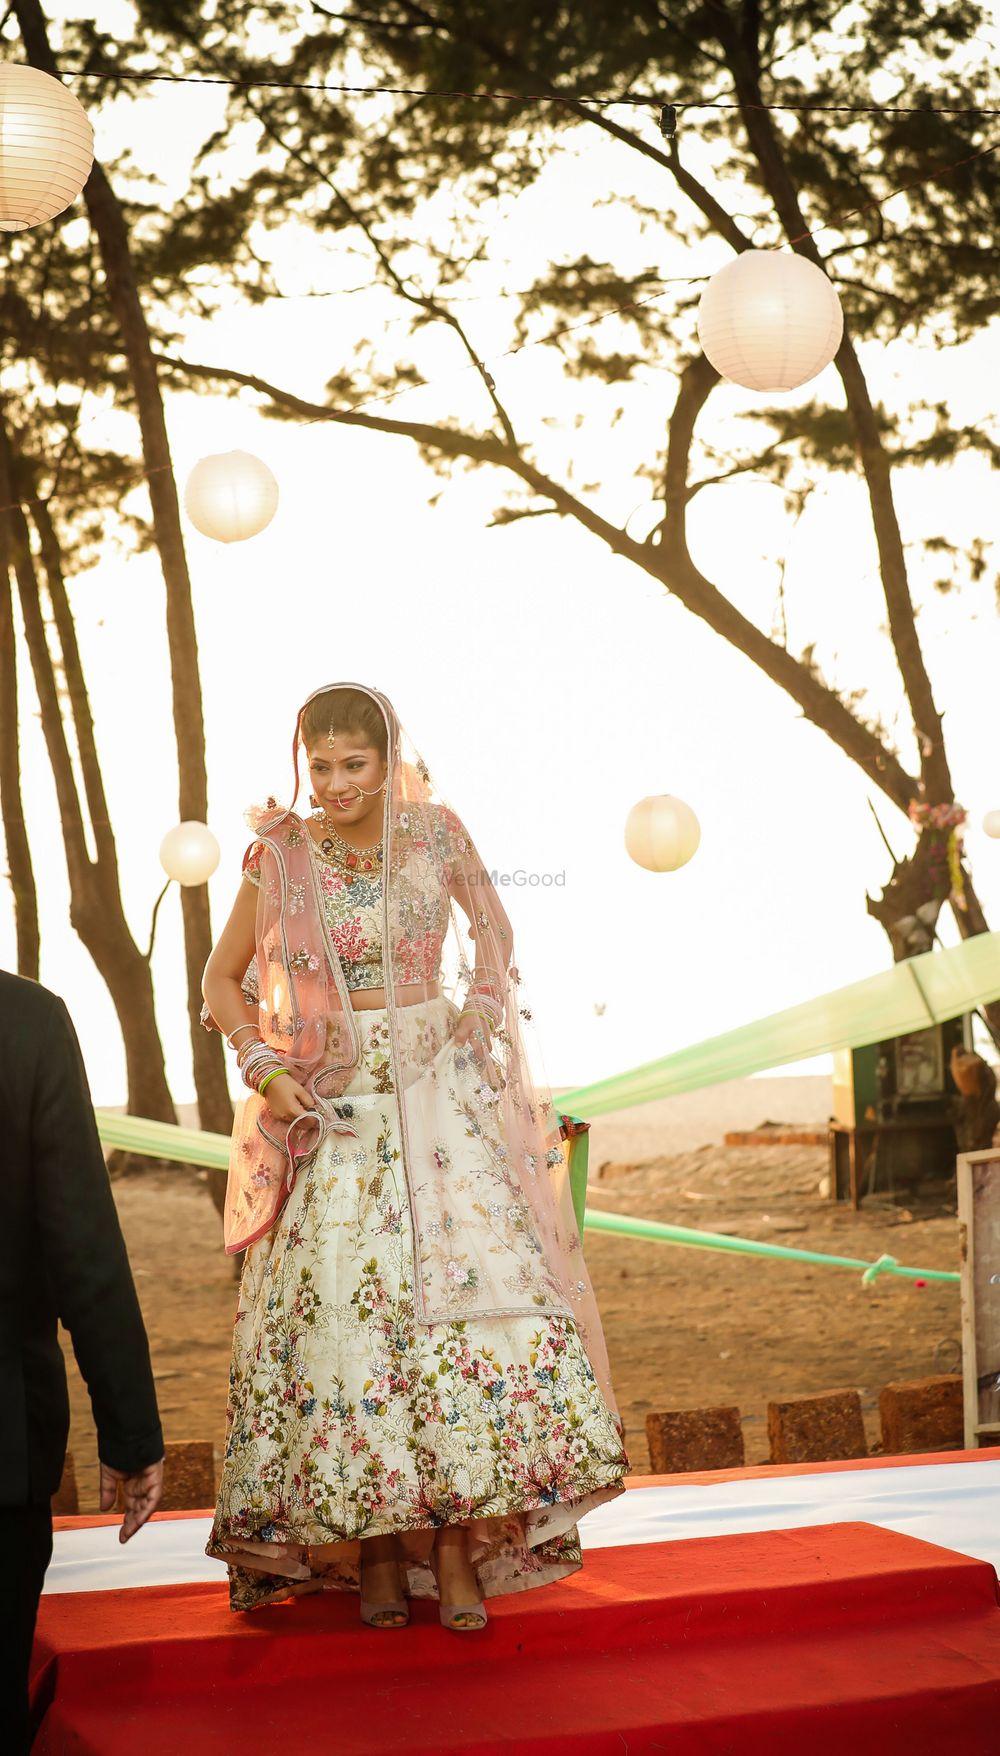 Photo From Brides #dipakstudios 2016-2017 - By Dipak Studios Wedding Photography